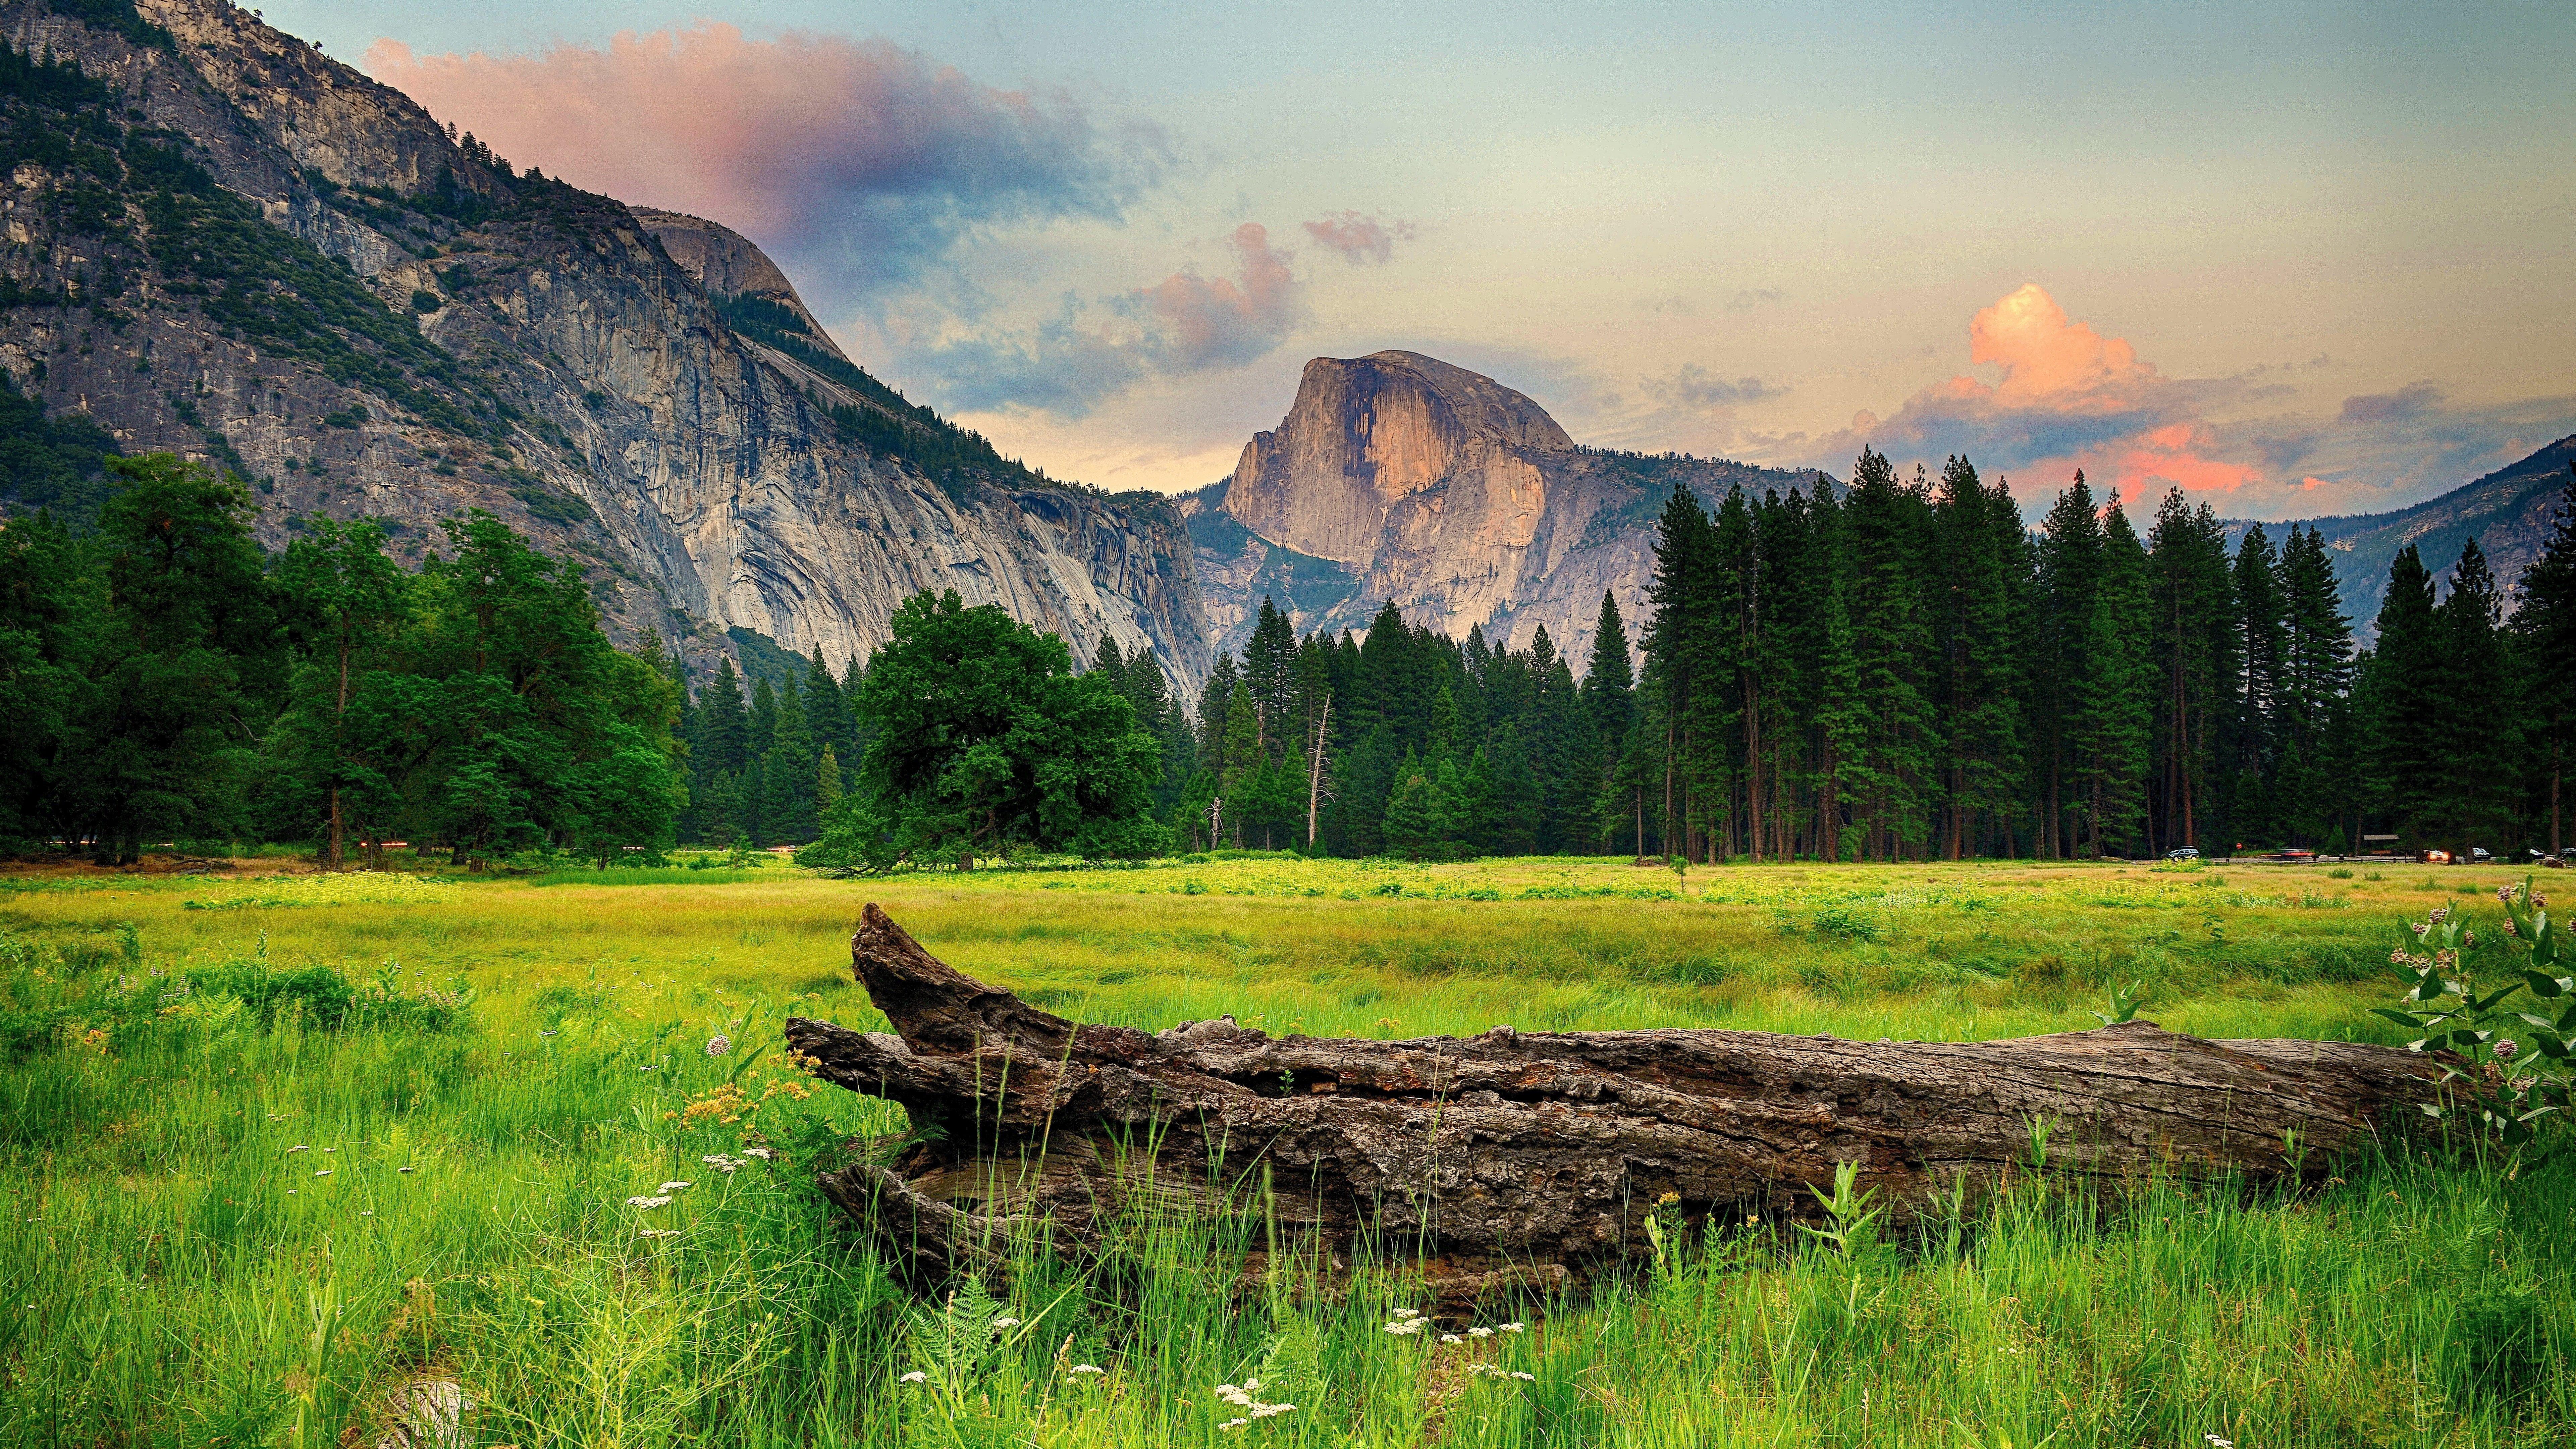 Ultra Hd 8k Resolution 7680x4320 Nature 8k Wallpaper Hdwallpaper Desktop Landscape Wallpaper Tree Landscape Wallpaper Yosemite Wallpaper